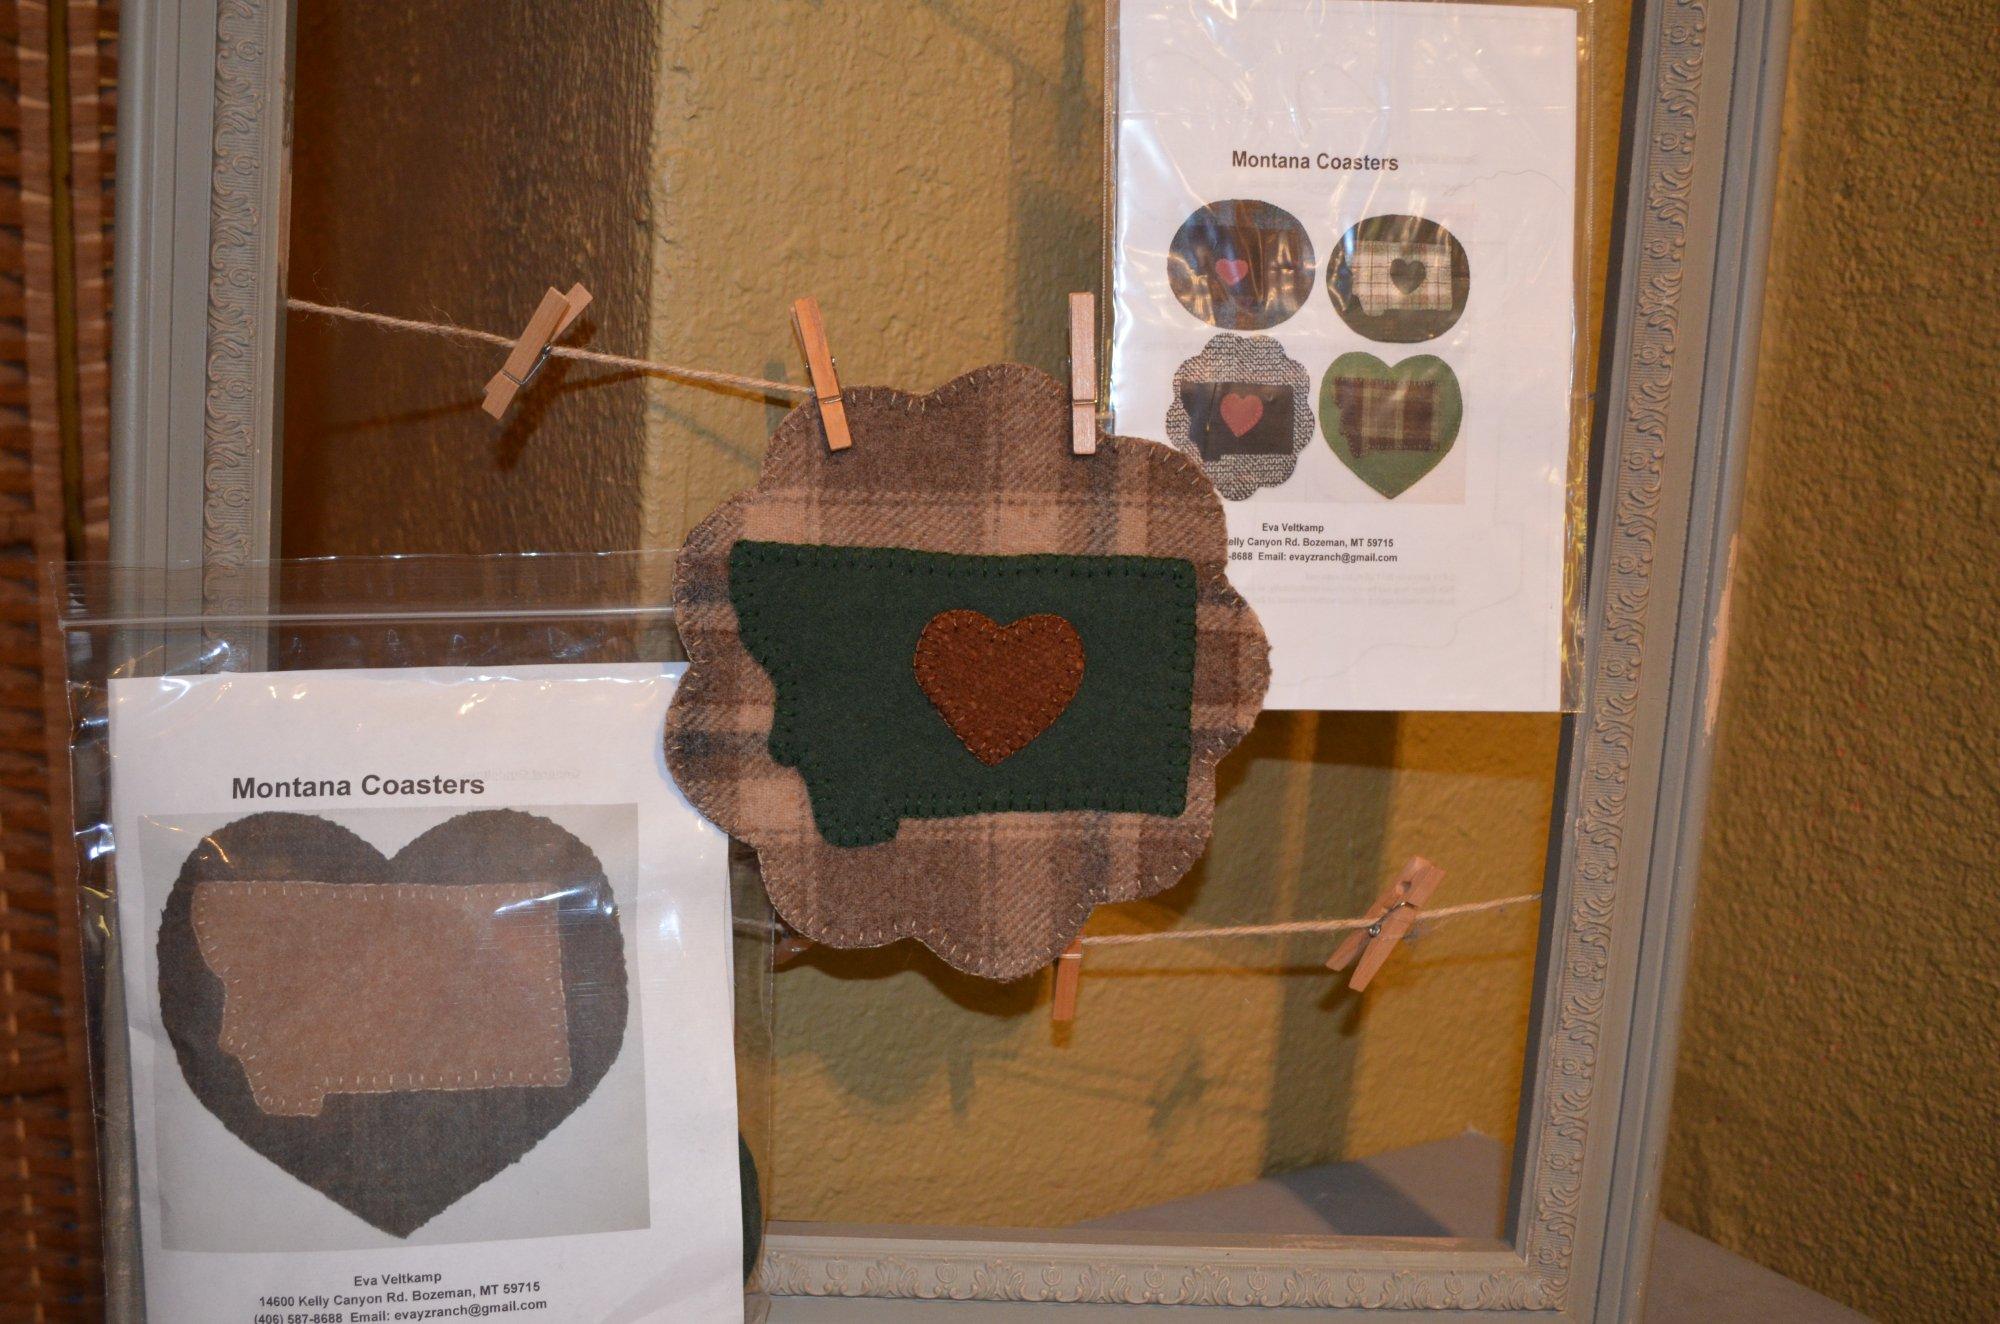 Montana Wool Coasters Kit FLOWER-4  By Eva Veltkamp 4ct.